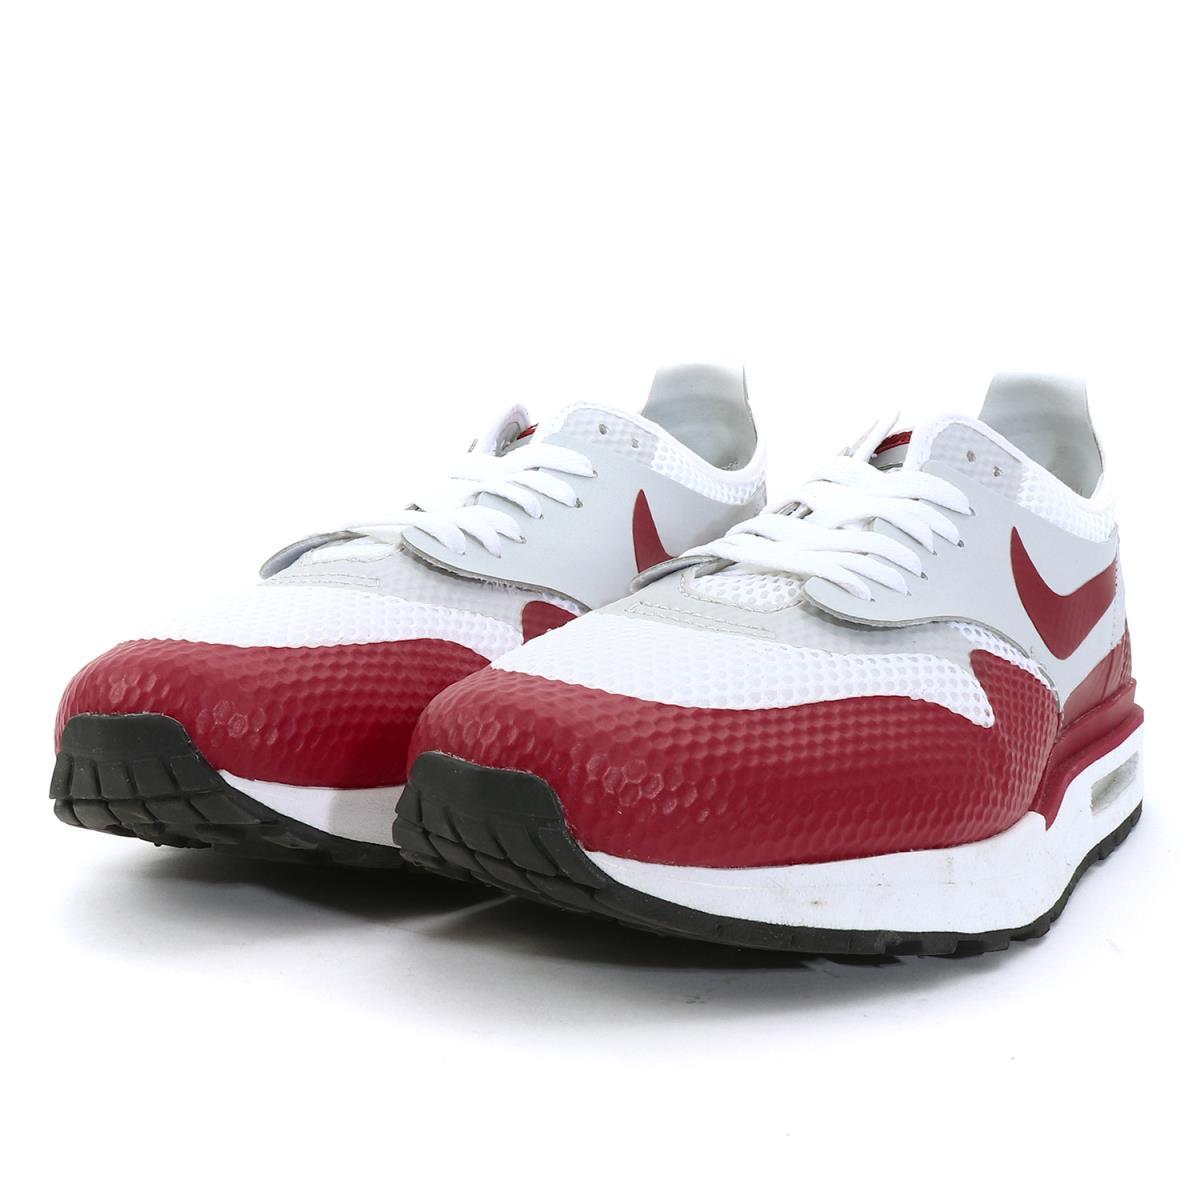 low priced 82659 6ec71 NIKE (Nike) AIR MAX 1 ROYAL SE SP (AA0869-100) white X gym red US10(28cm)